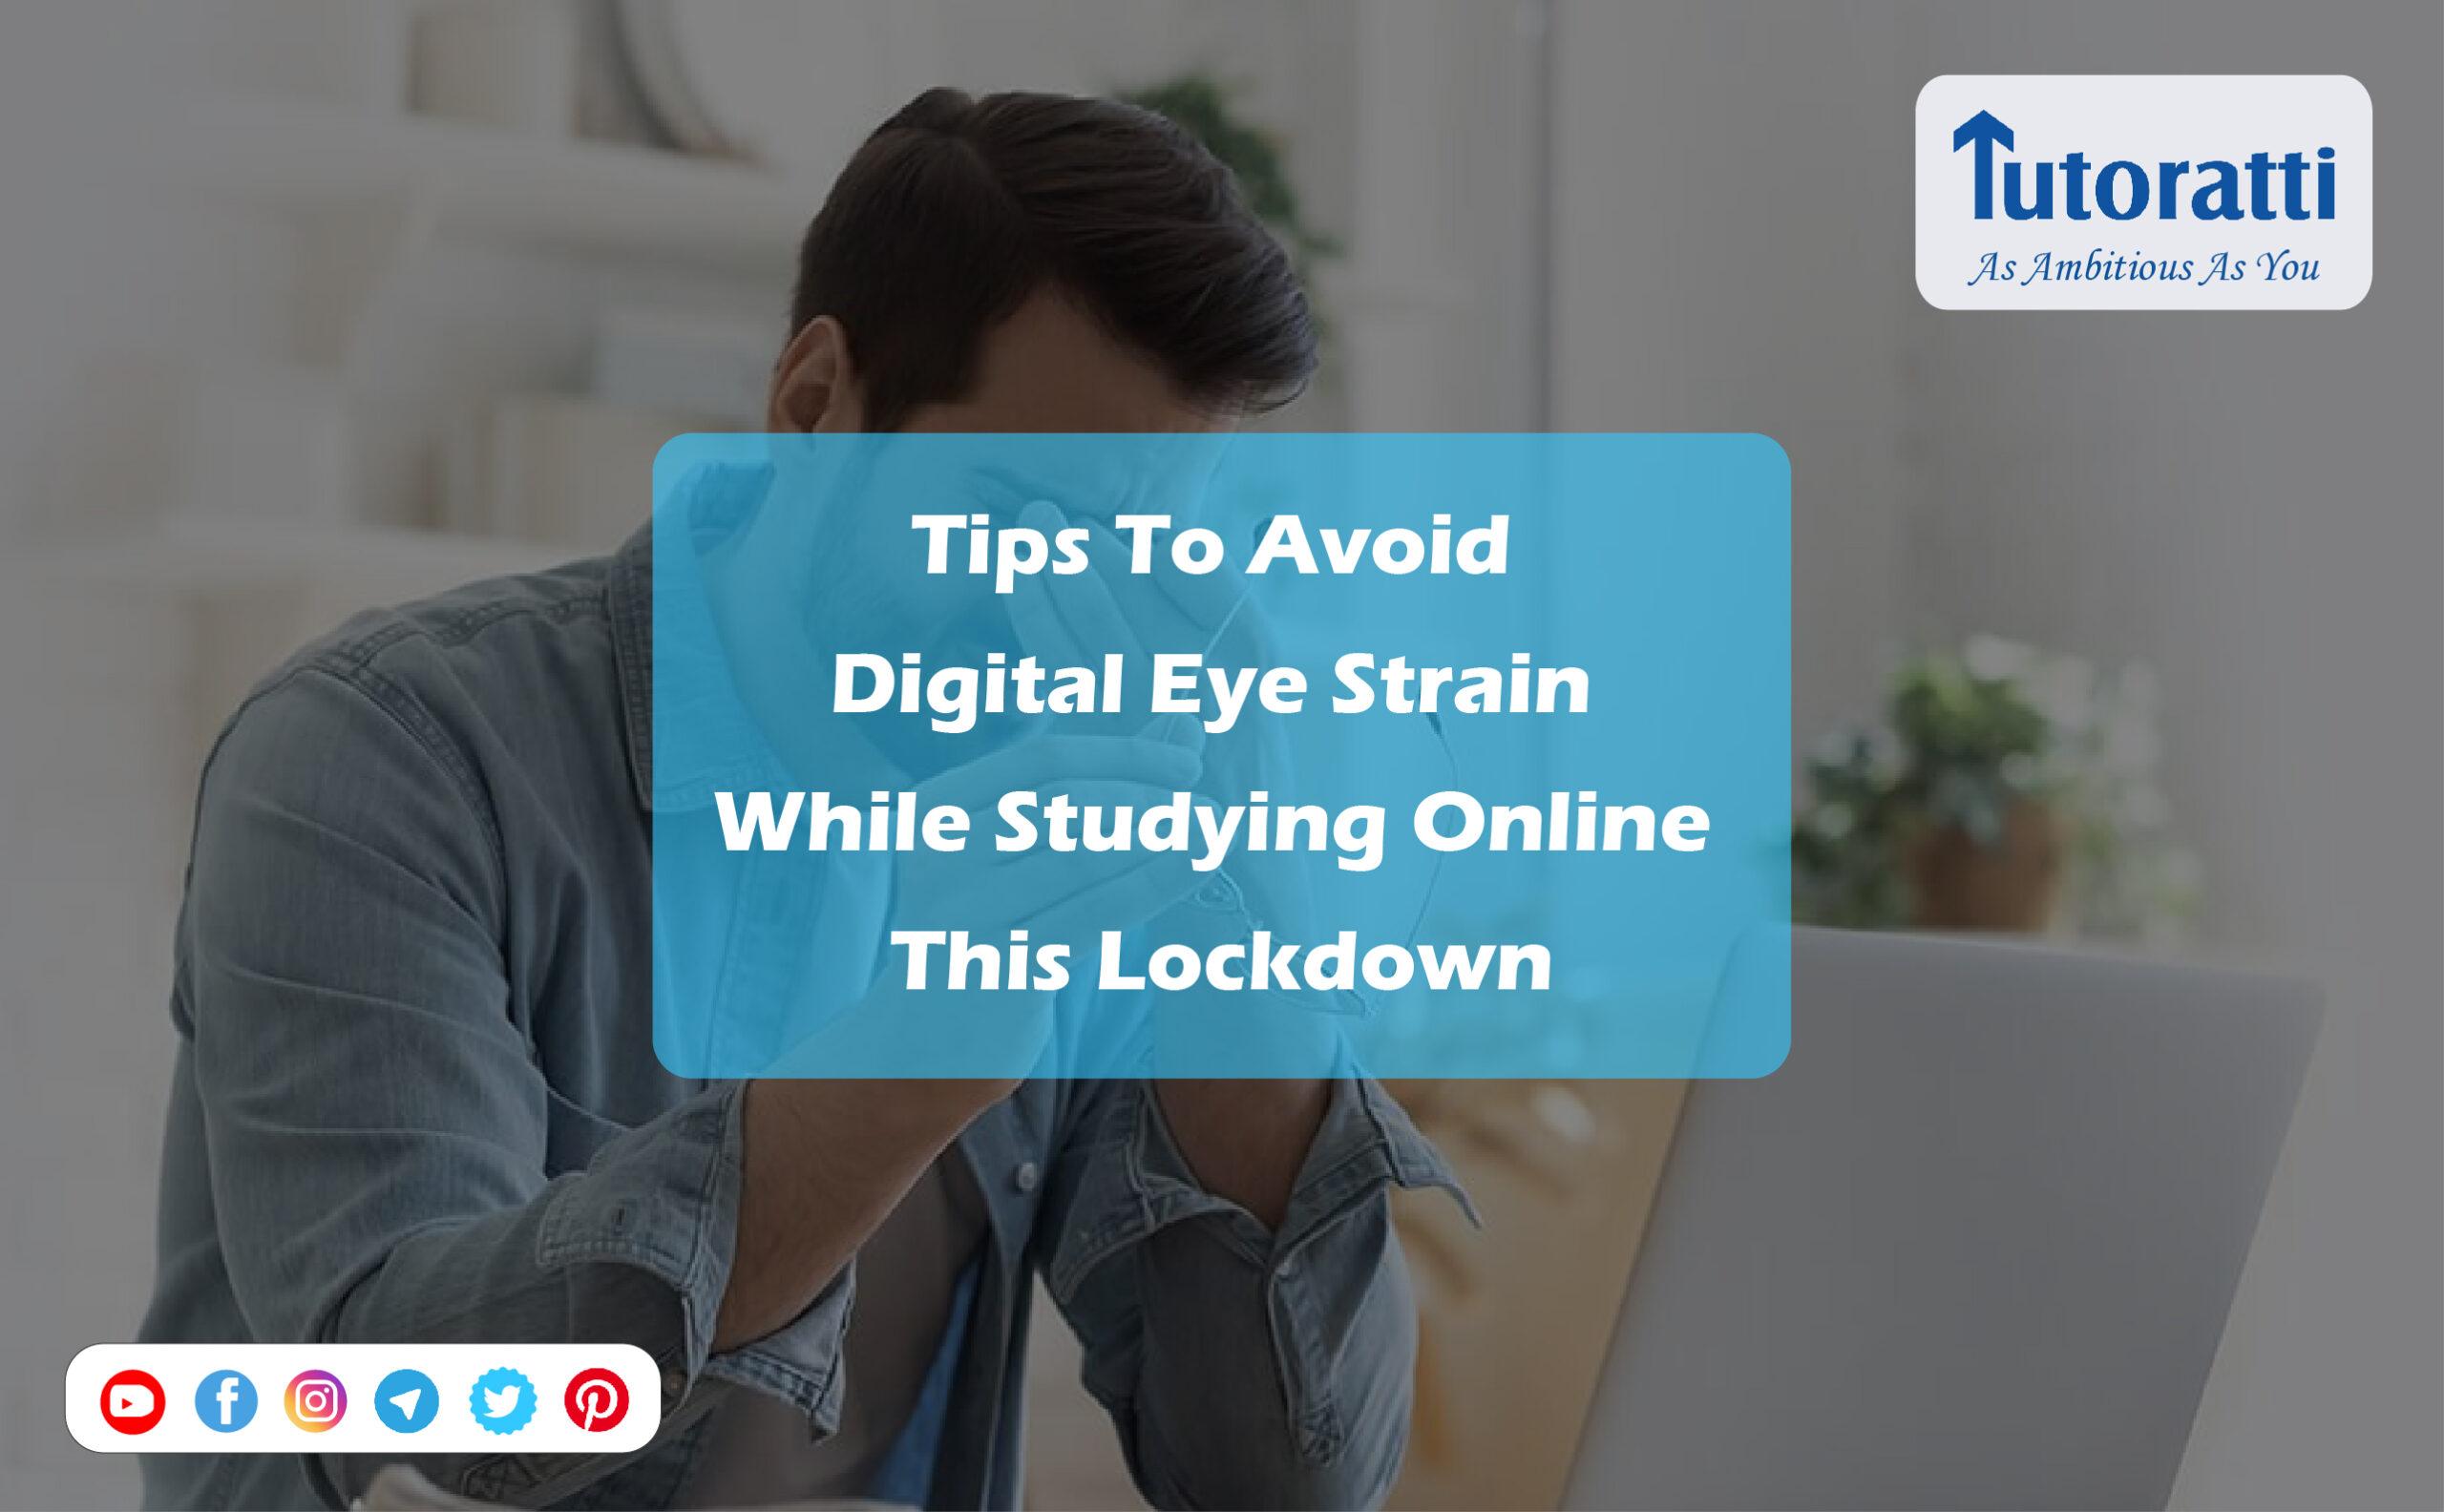 Avoid Digital Eye Strain While Studying Online This Lockdown